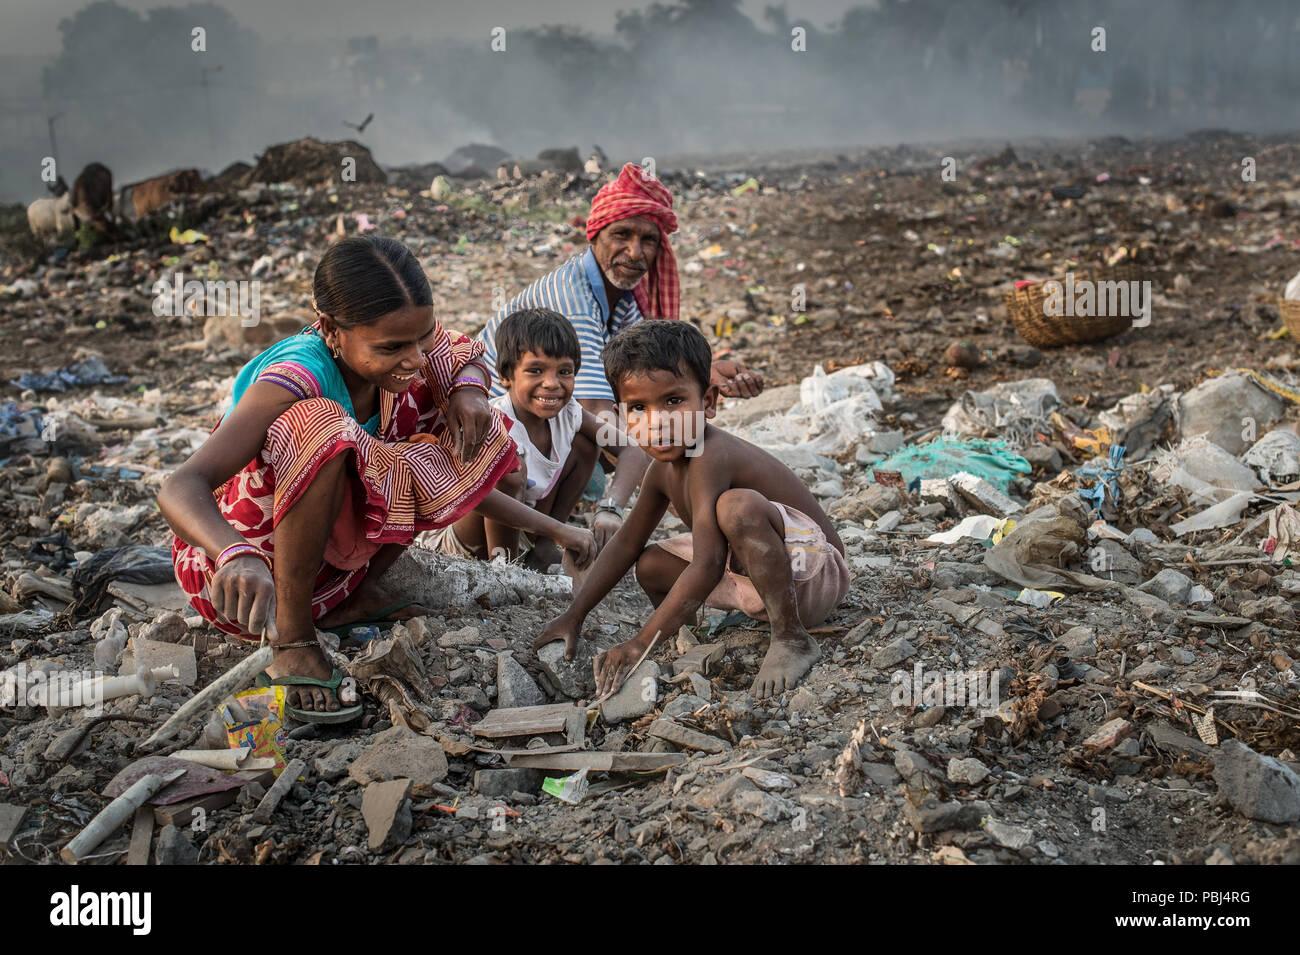 Indian dalit family collects rubbish in the Kolkata landfill known as the Garbage Mountain, Kolkata, West Bengal, India Stock Photo